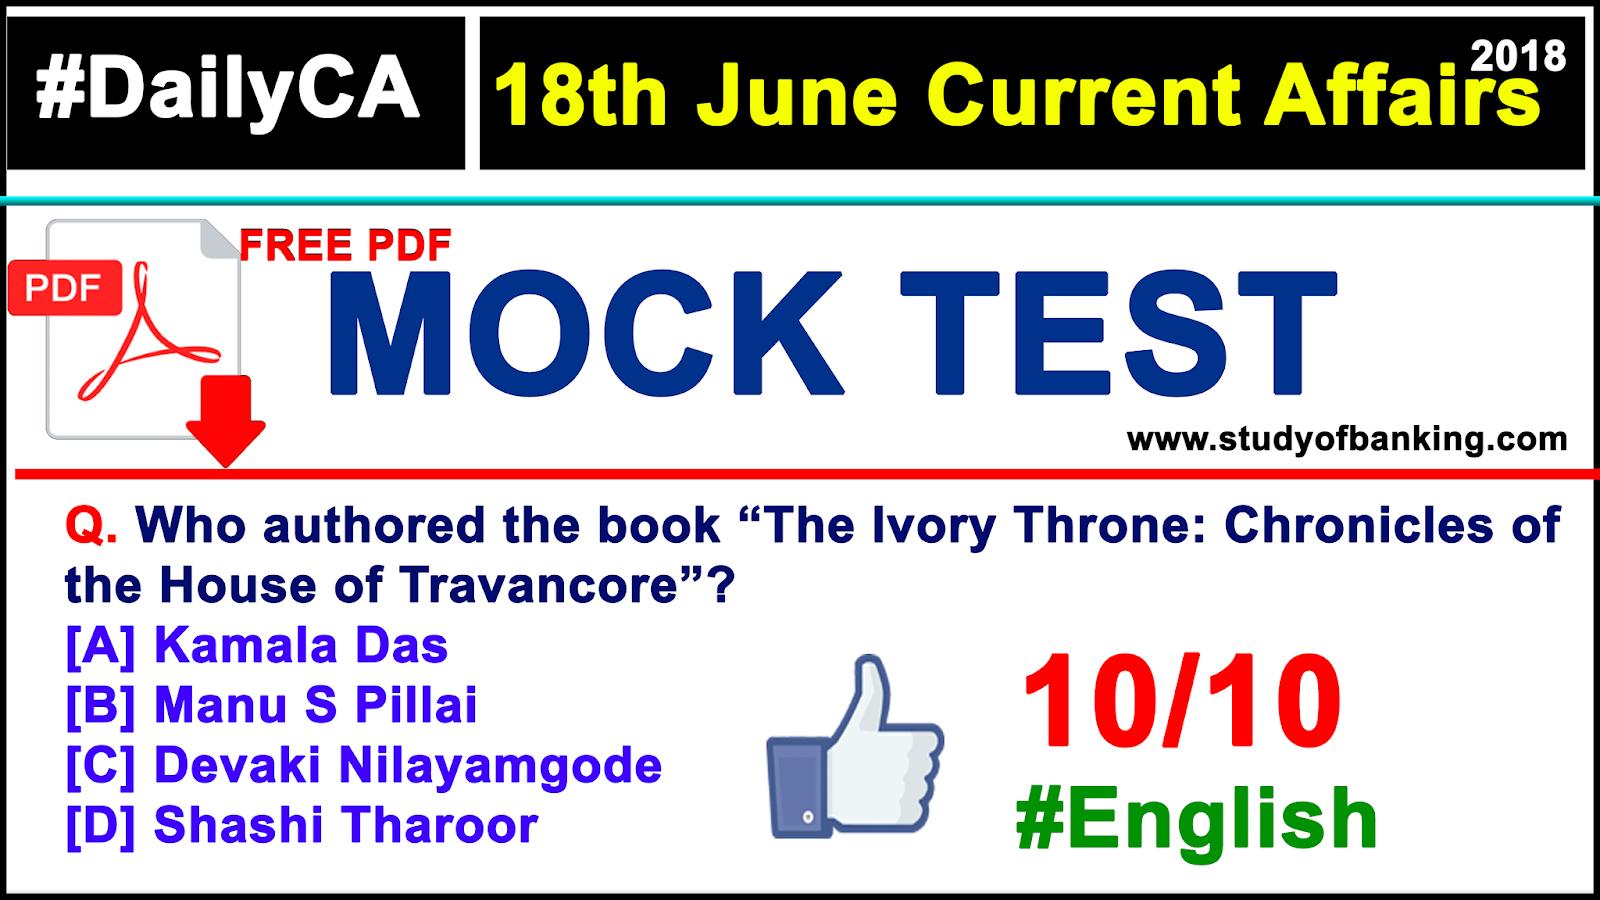 #DailyCA: 18th June 2018 Current Affairs Quiz English